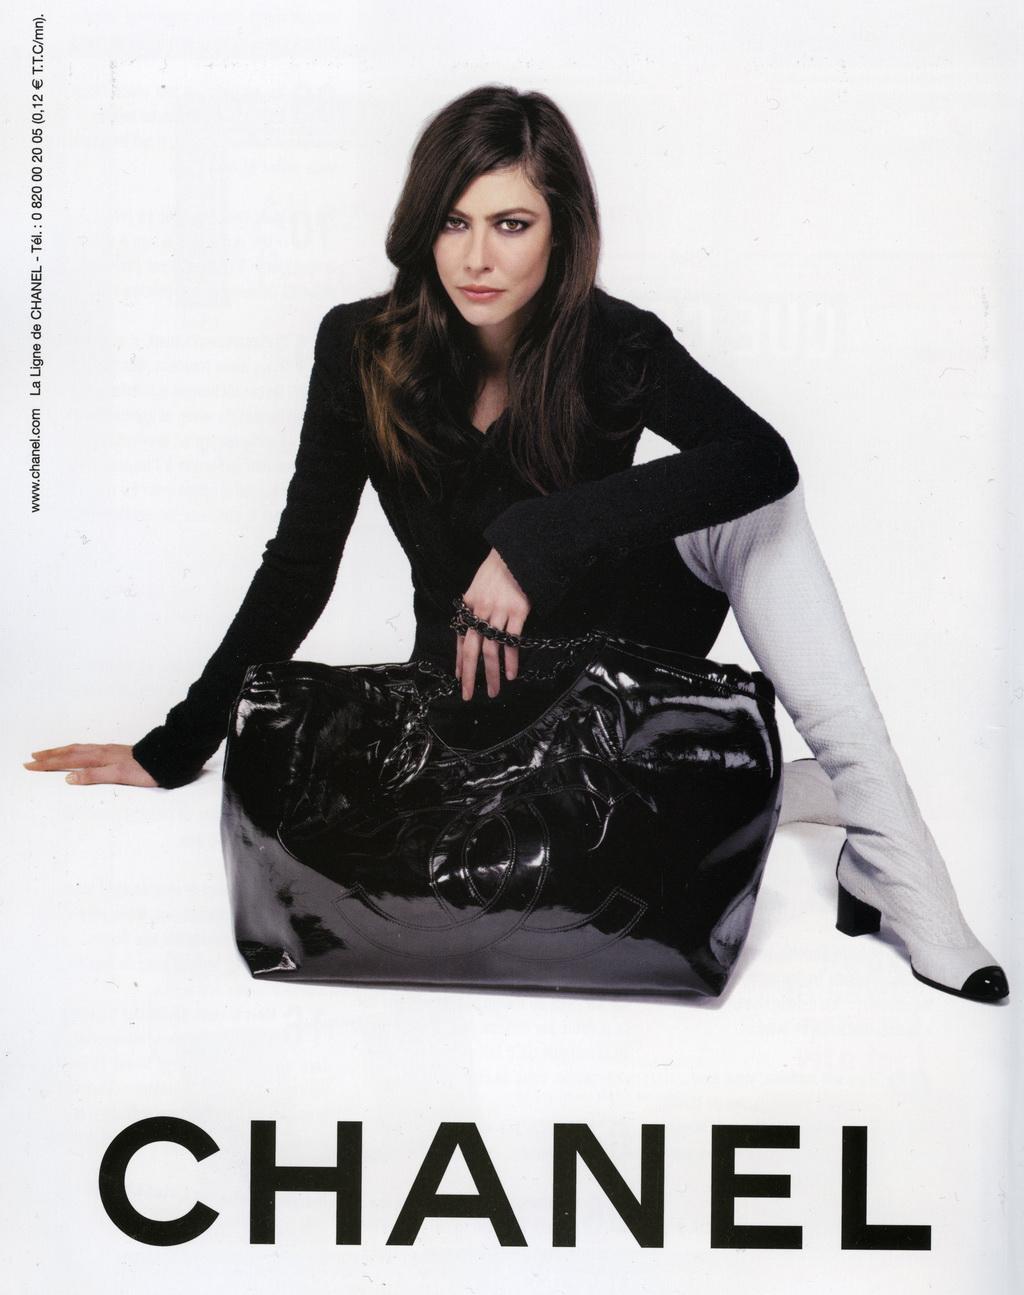 http://4.bp.blogspot.com/-3dhWC9ZVlC4/UEZBTMiZAiI/AAAAAAAAAeQ/pifcuPKcBNg/s1600/Anna+Mouglalis+Chanel+Fashion.jpg